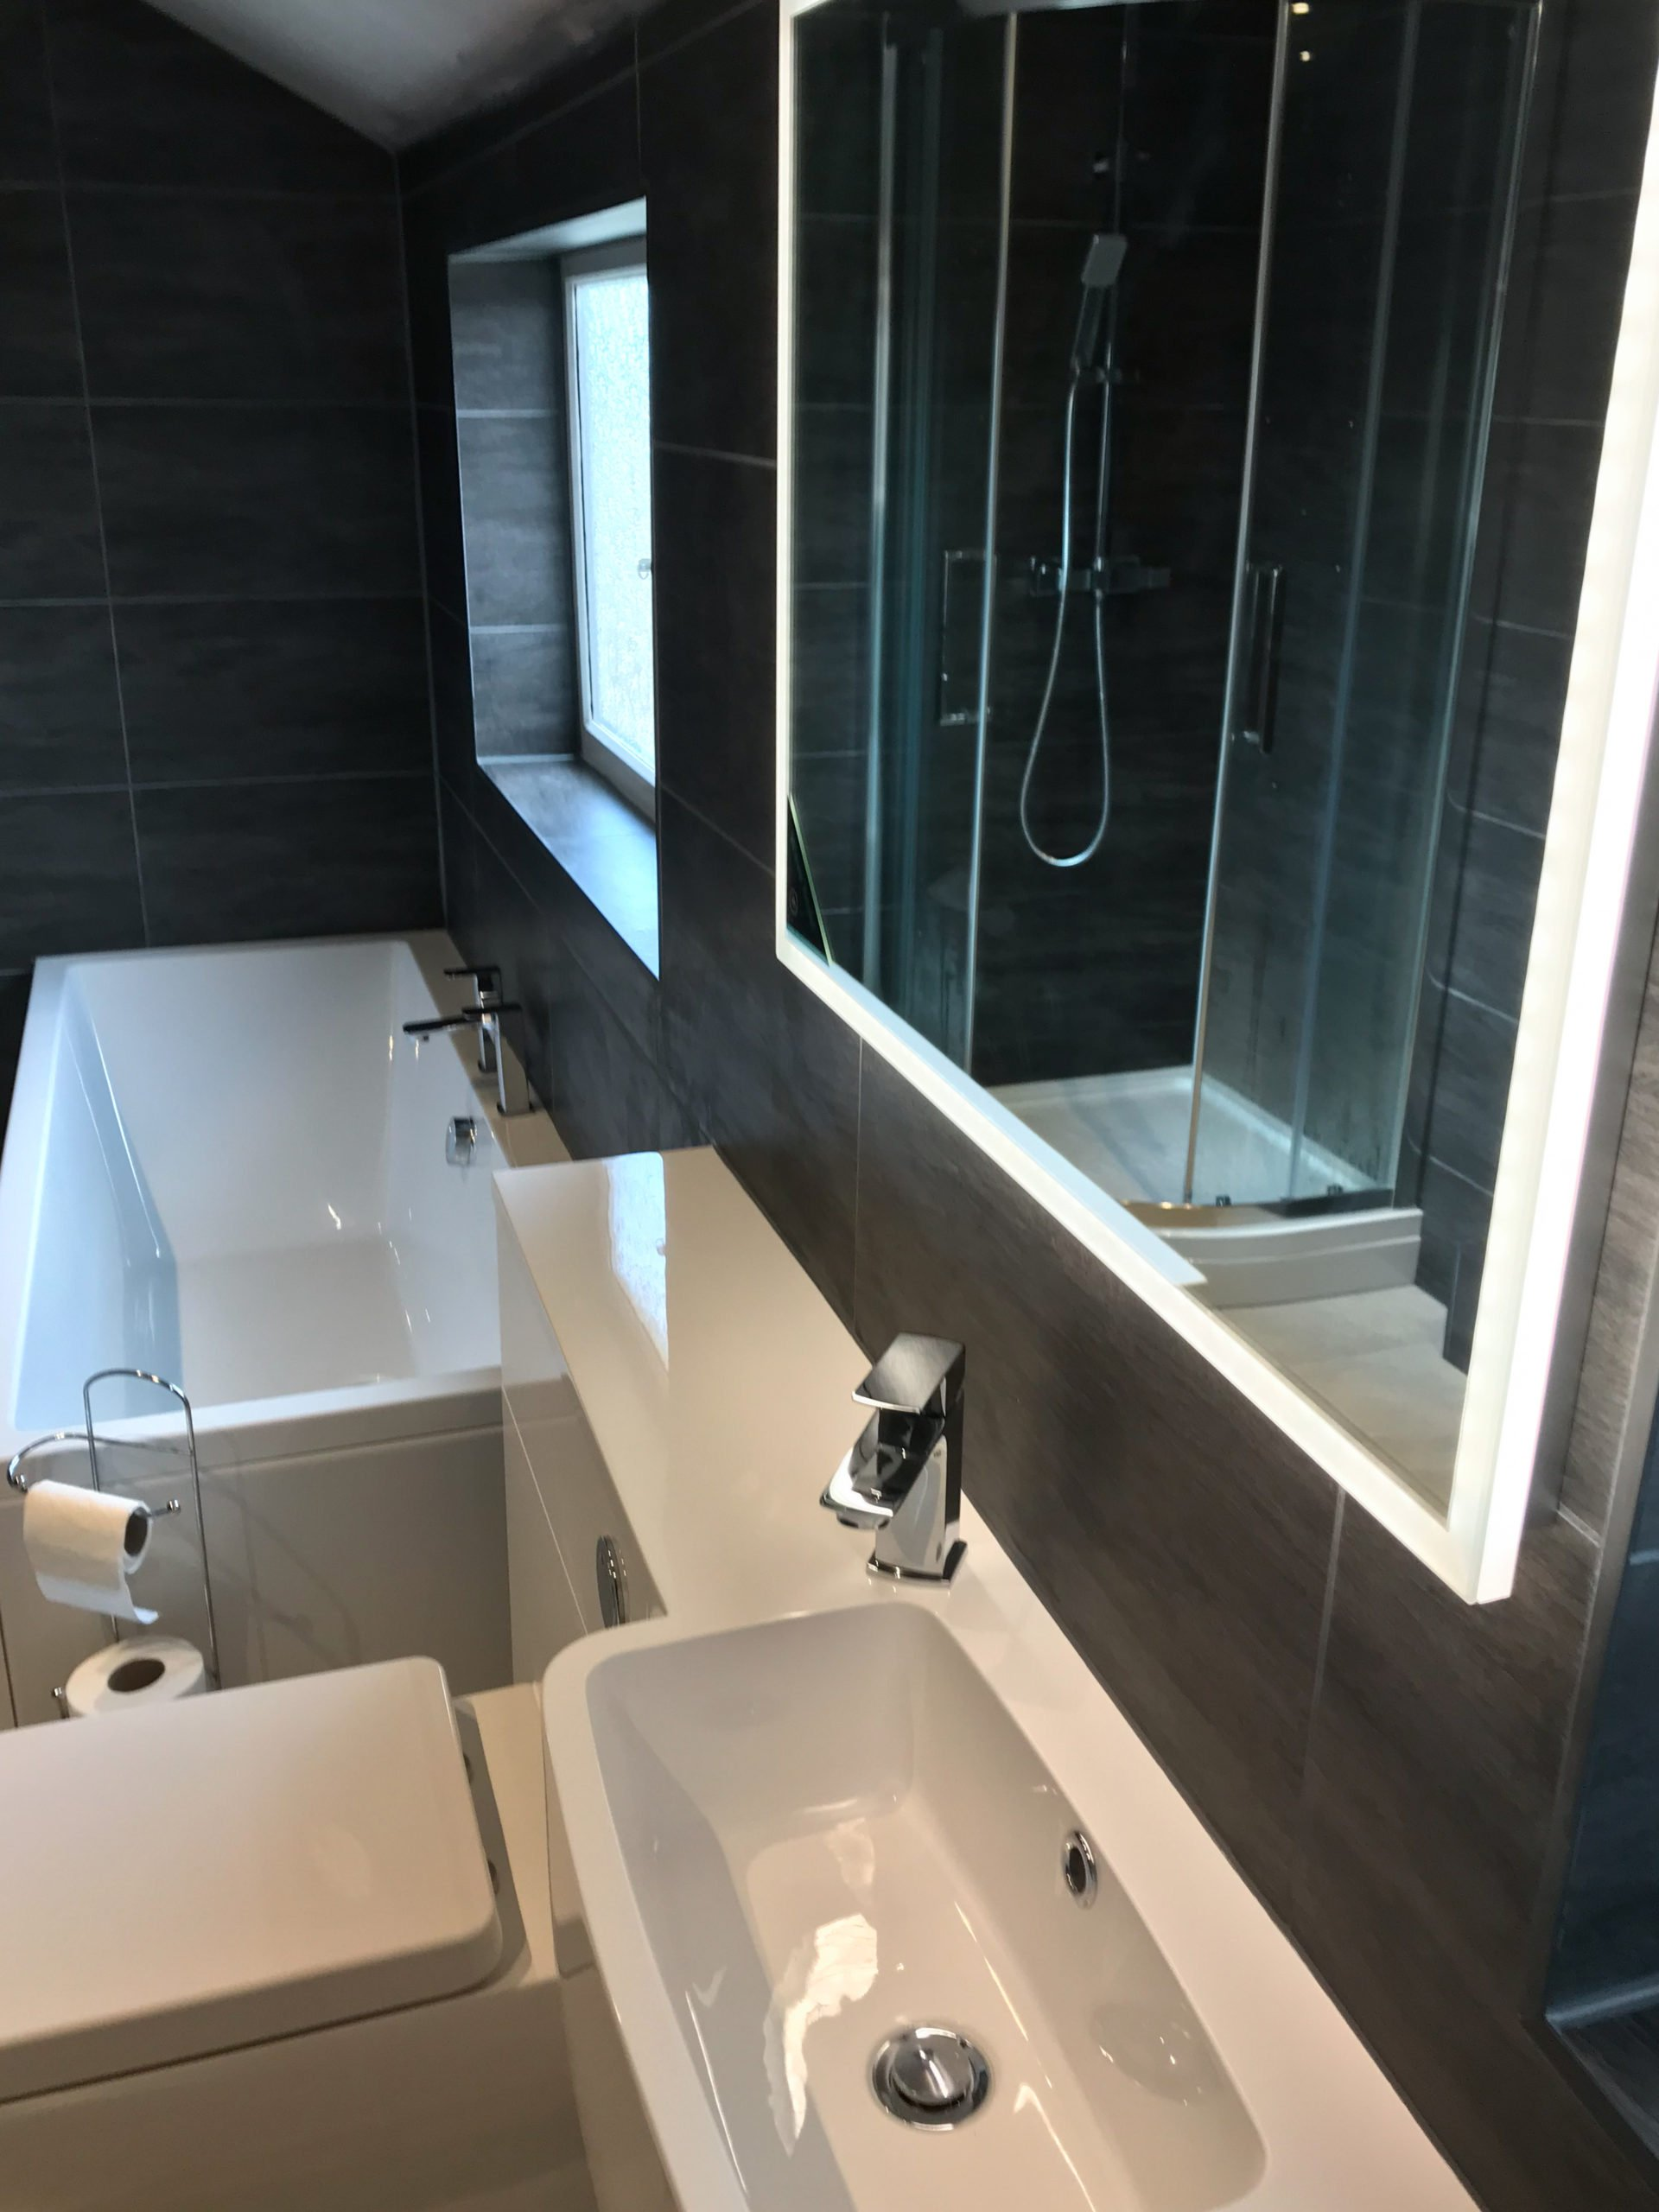 Illuminated HIB Mirror brightens up a dark Bathroom